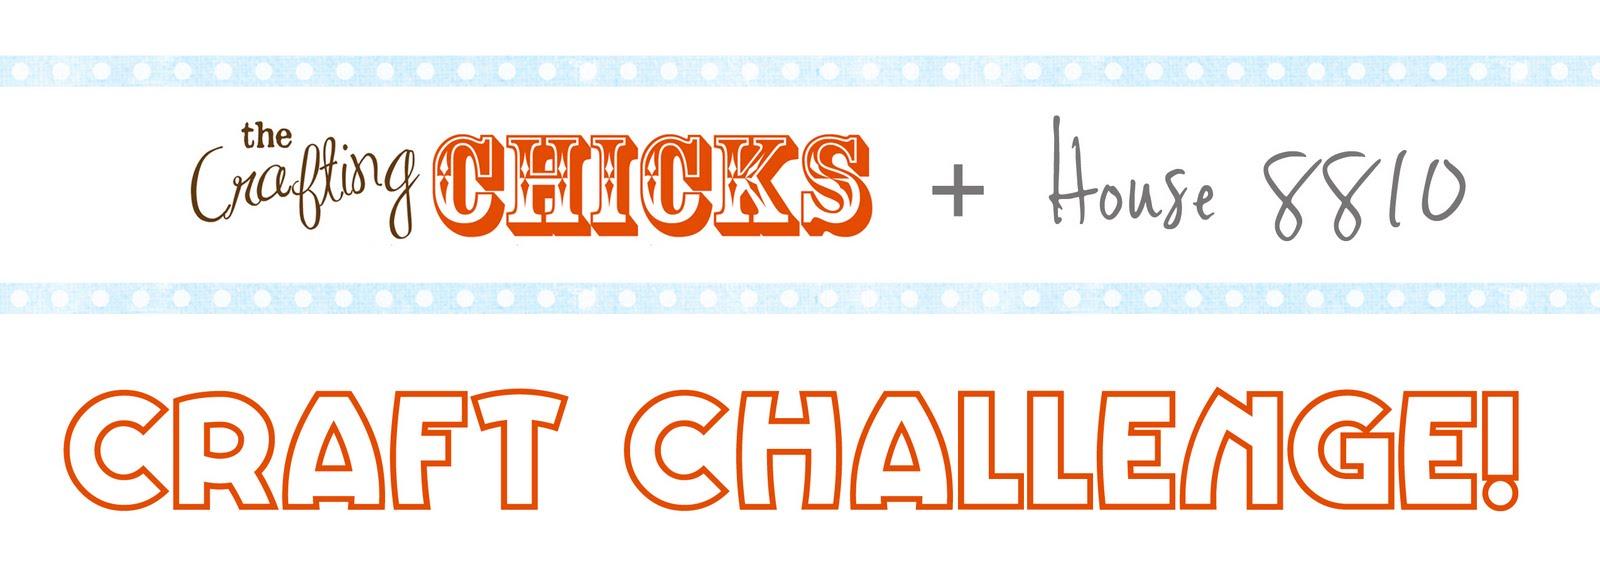 House 8810 Craft Challenge